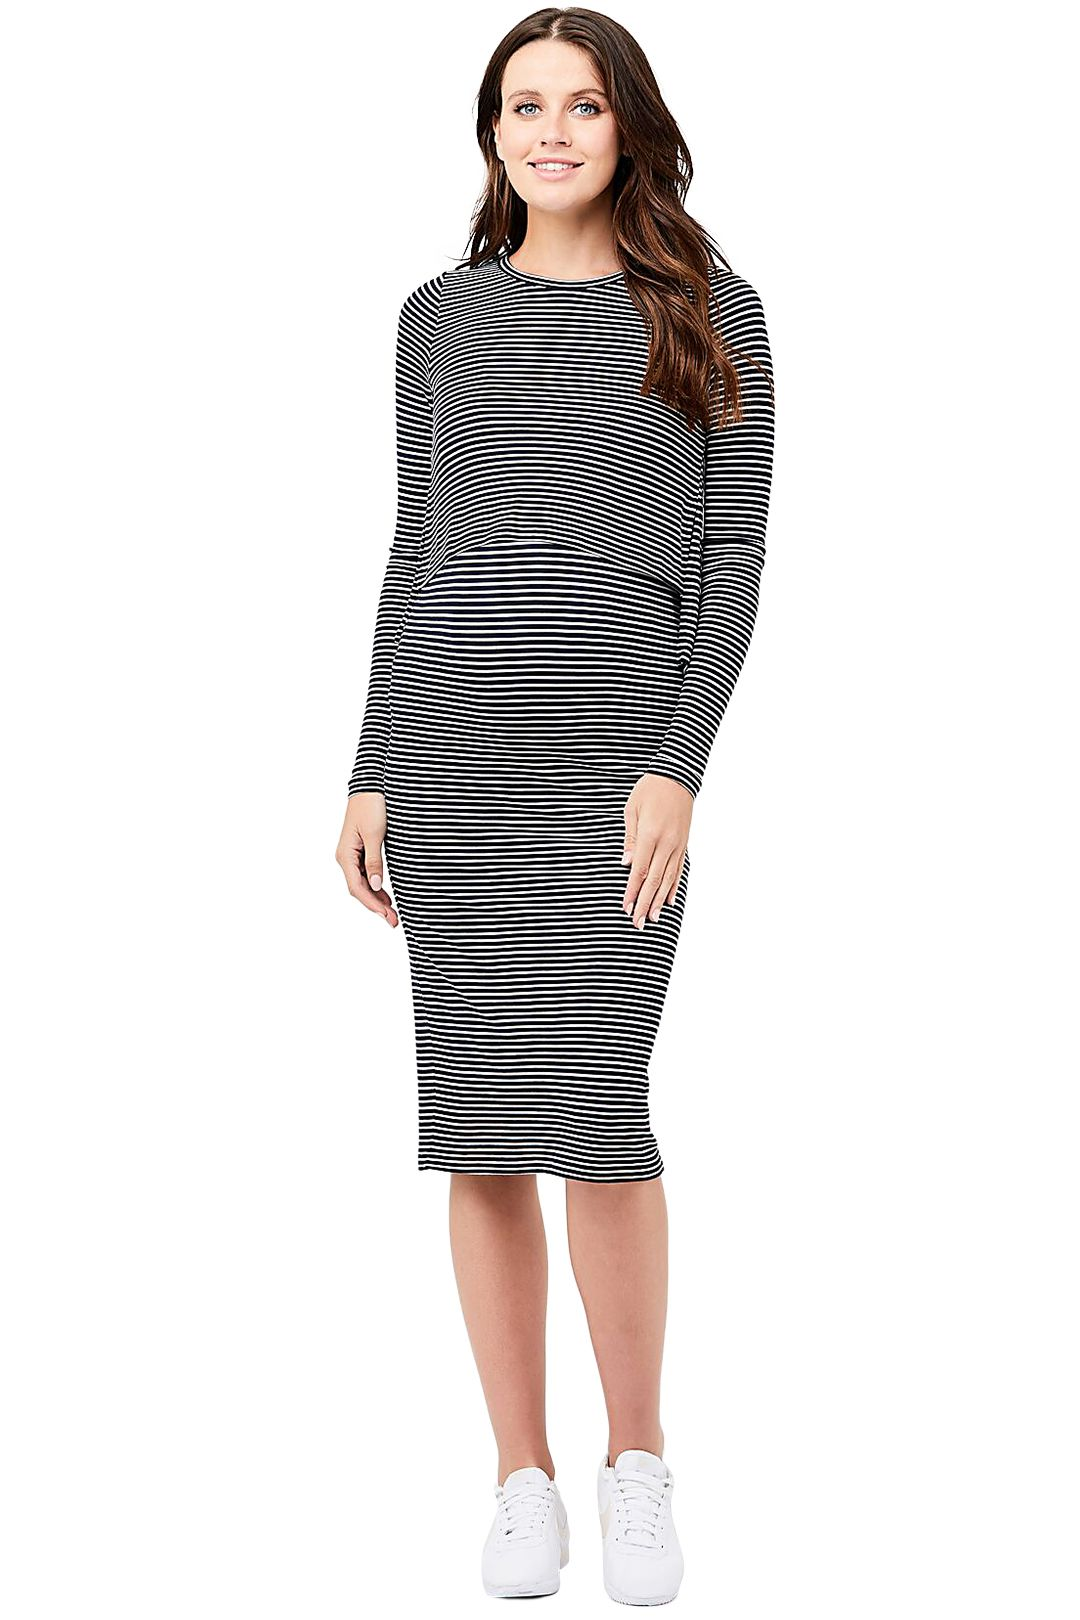 Ripe-Maternity-Kora-Nursing-Dress-Navy-White-Front